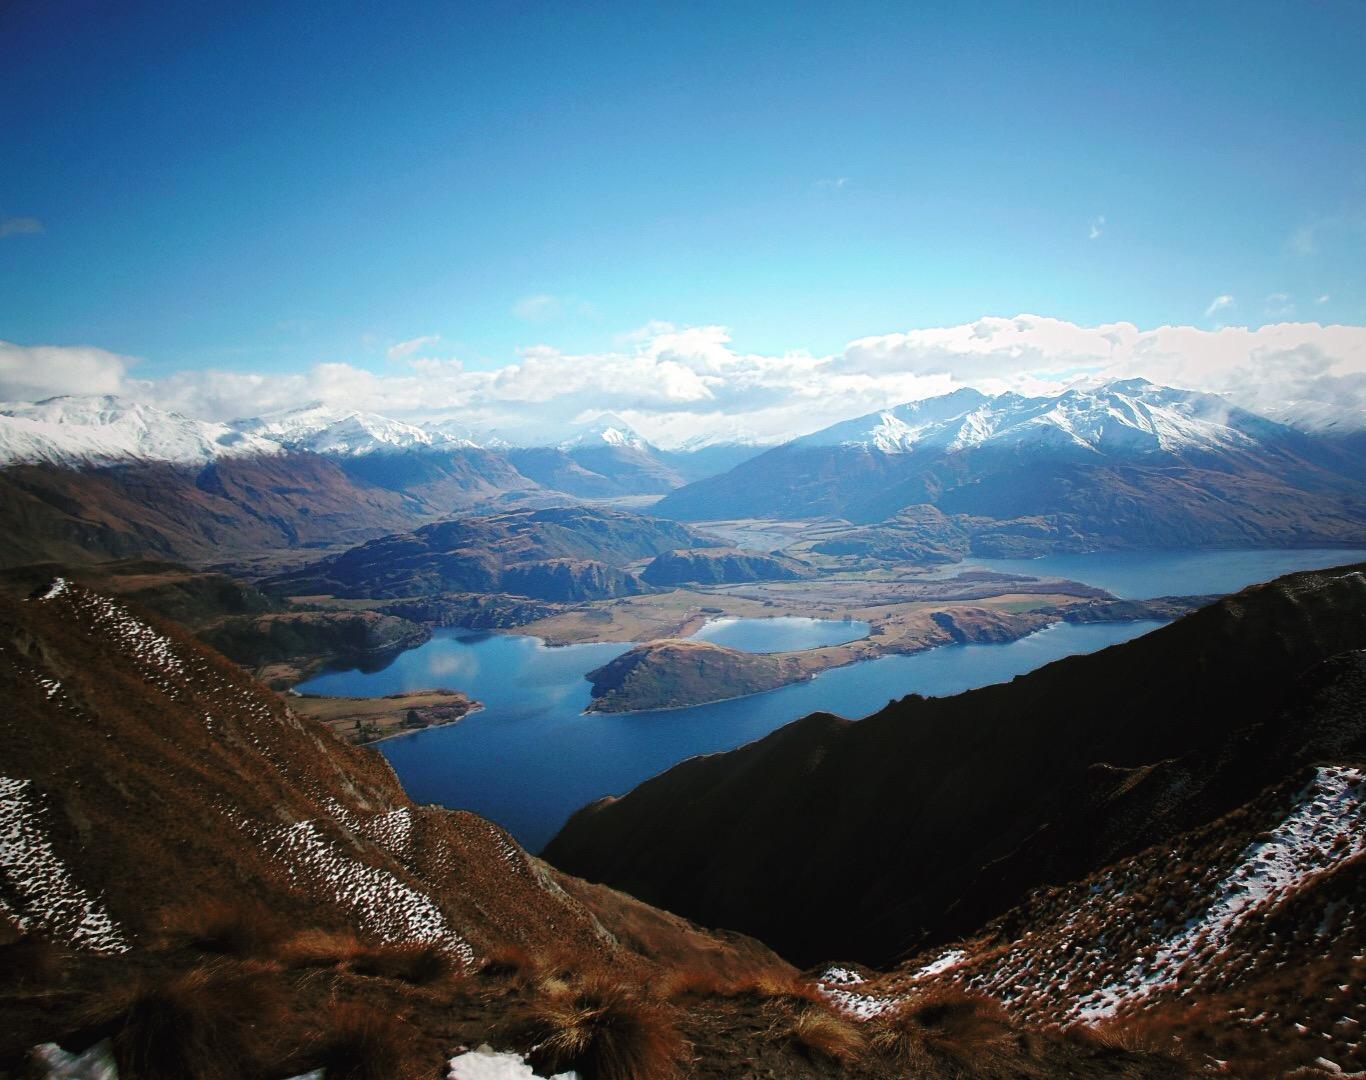 New Zealand's spectacular South Island